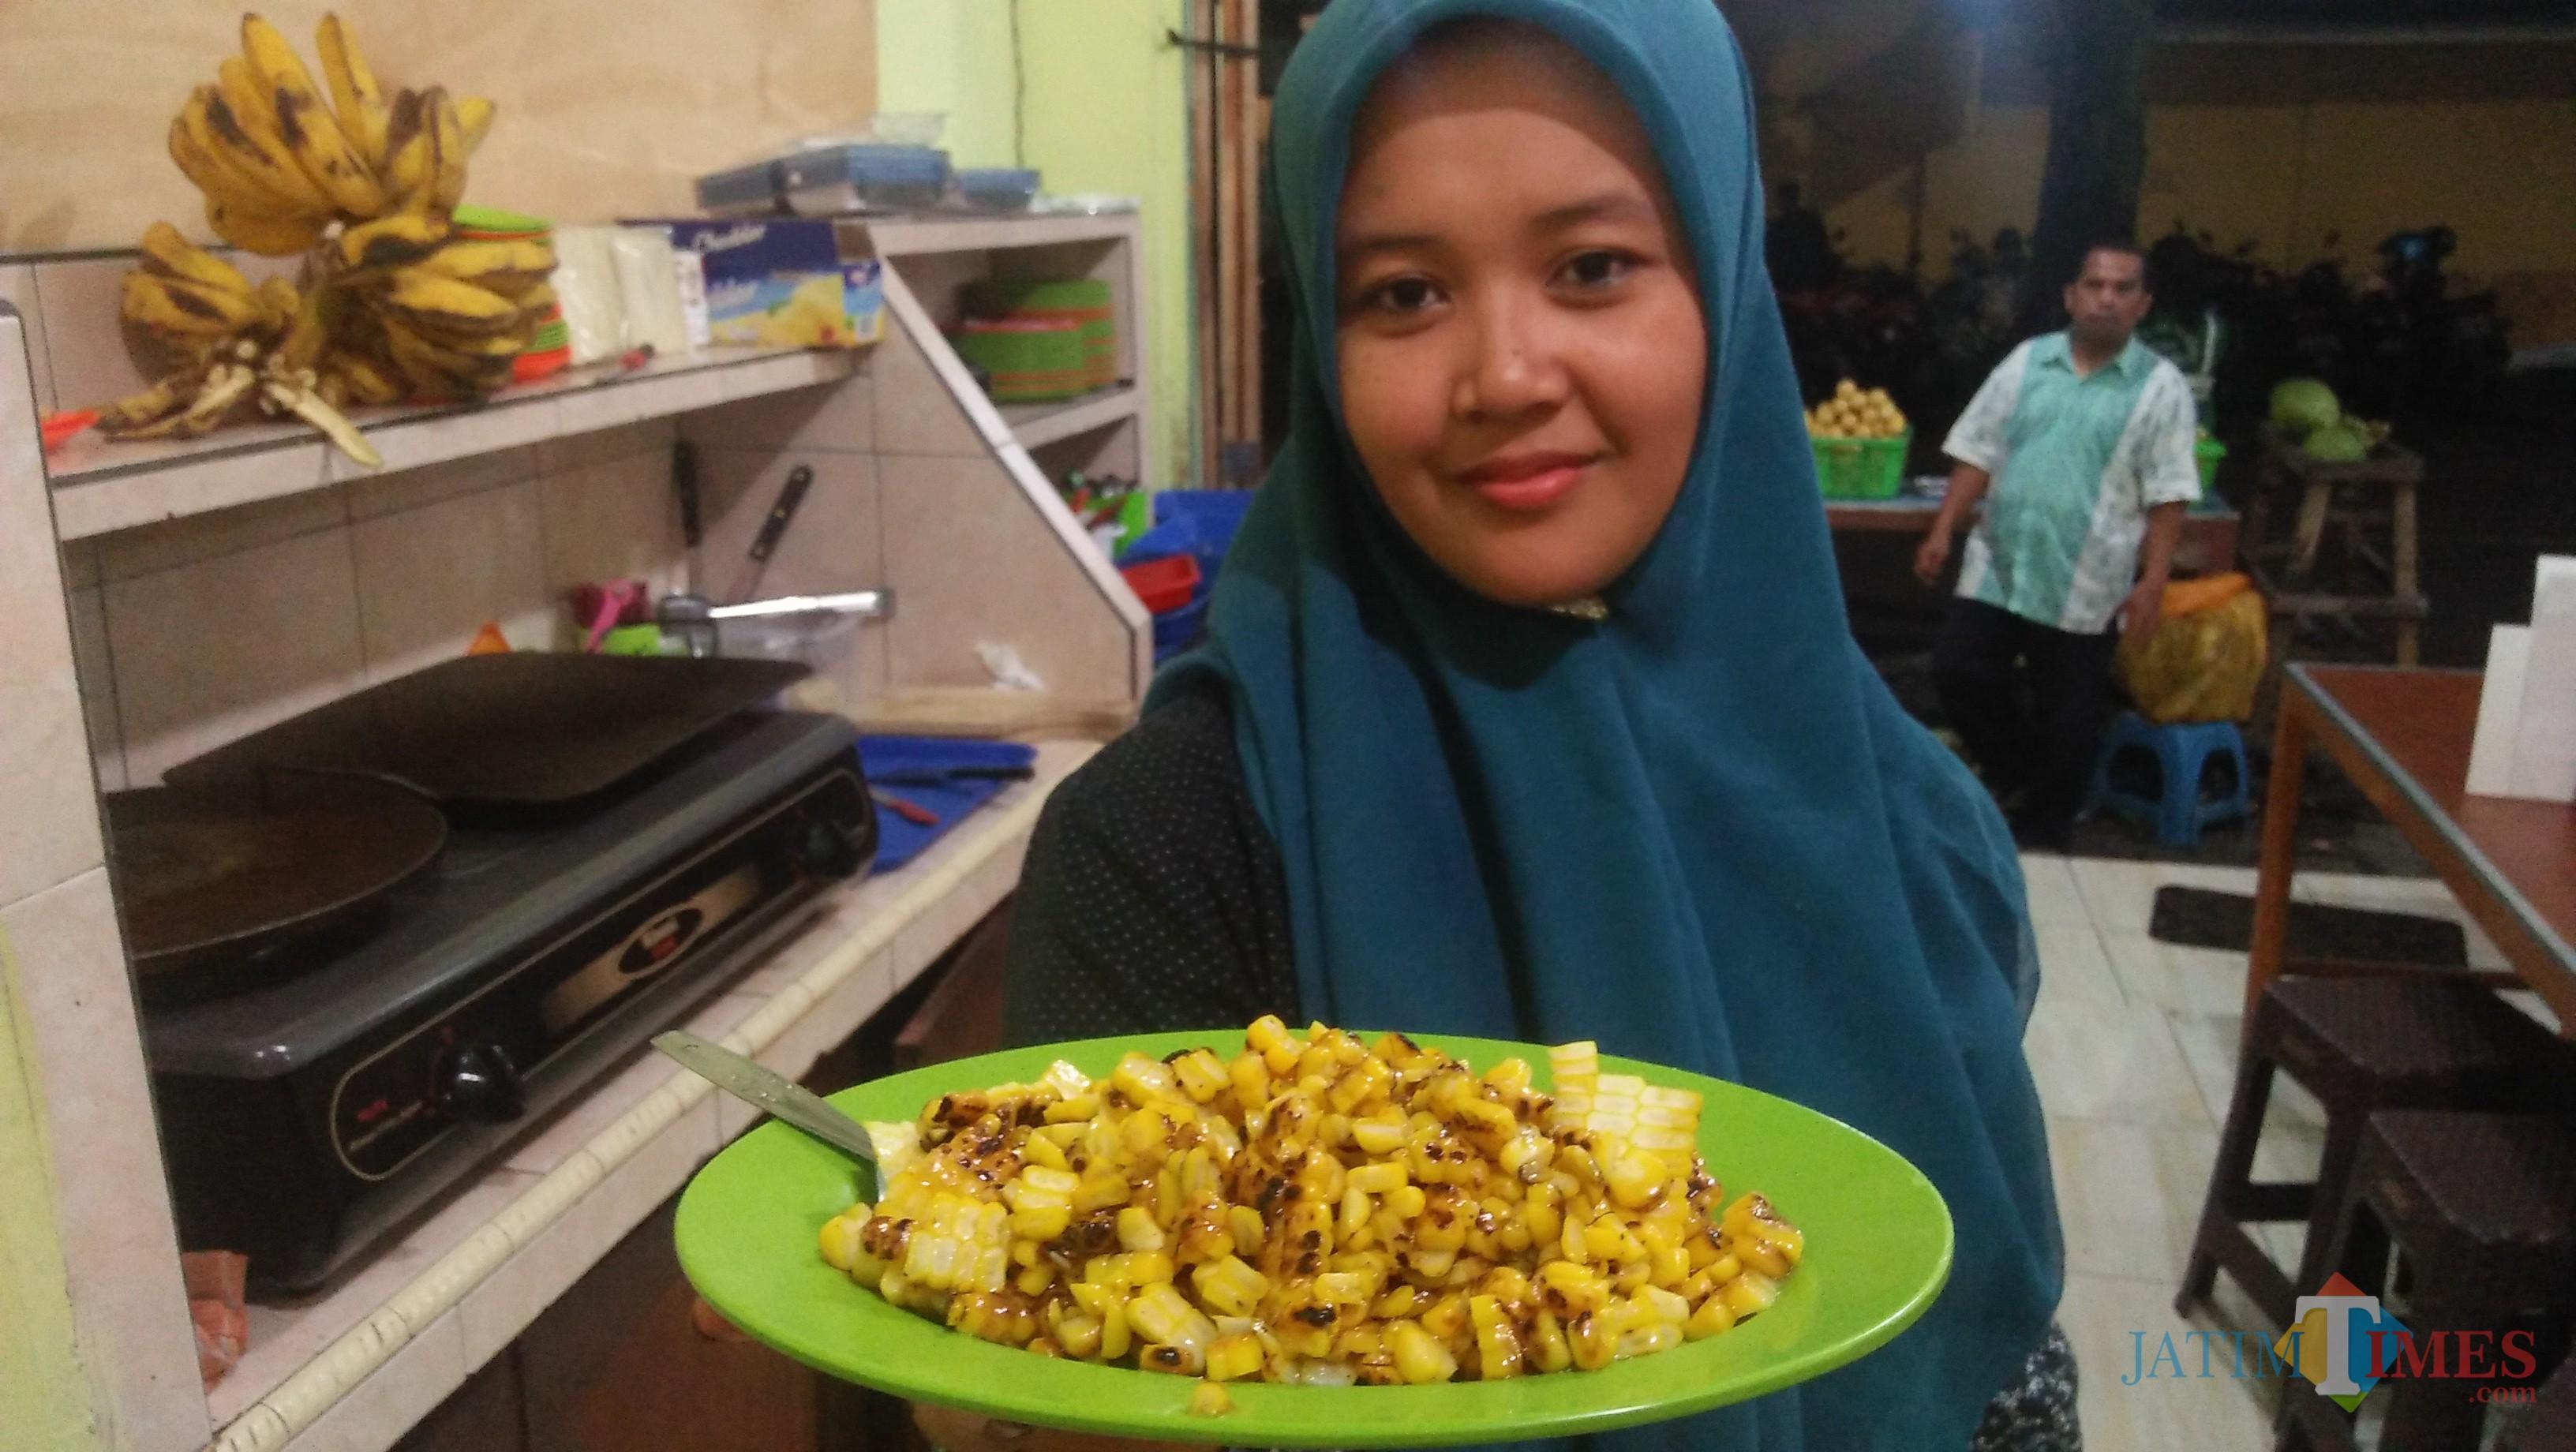 Jagung bakar serut rasa campur yang menjadi menu favorit pelanggan ( foto Luqmanul hakim)